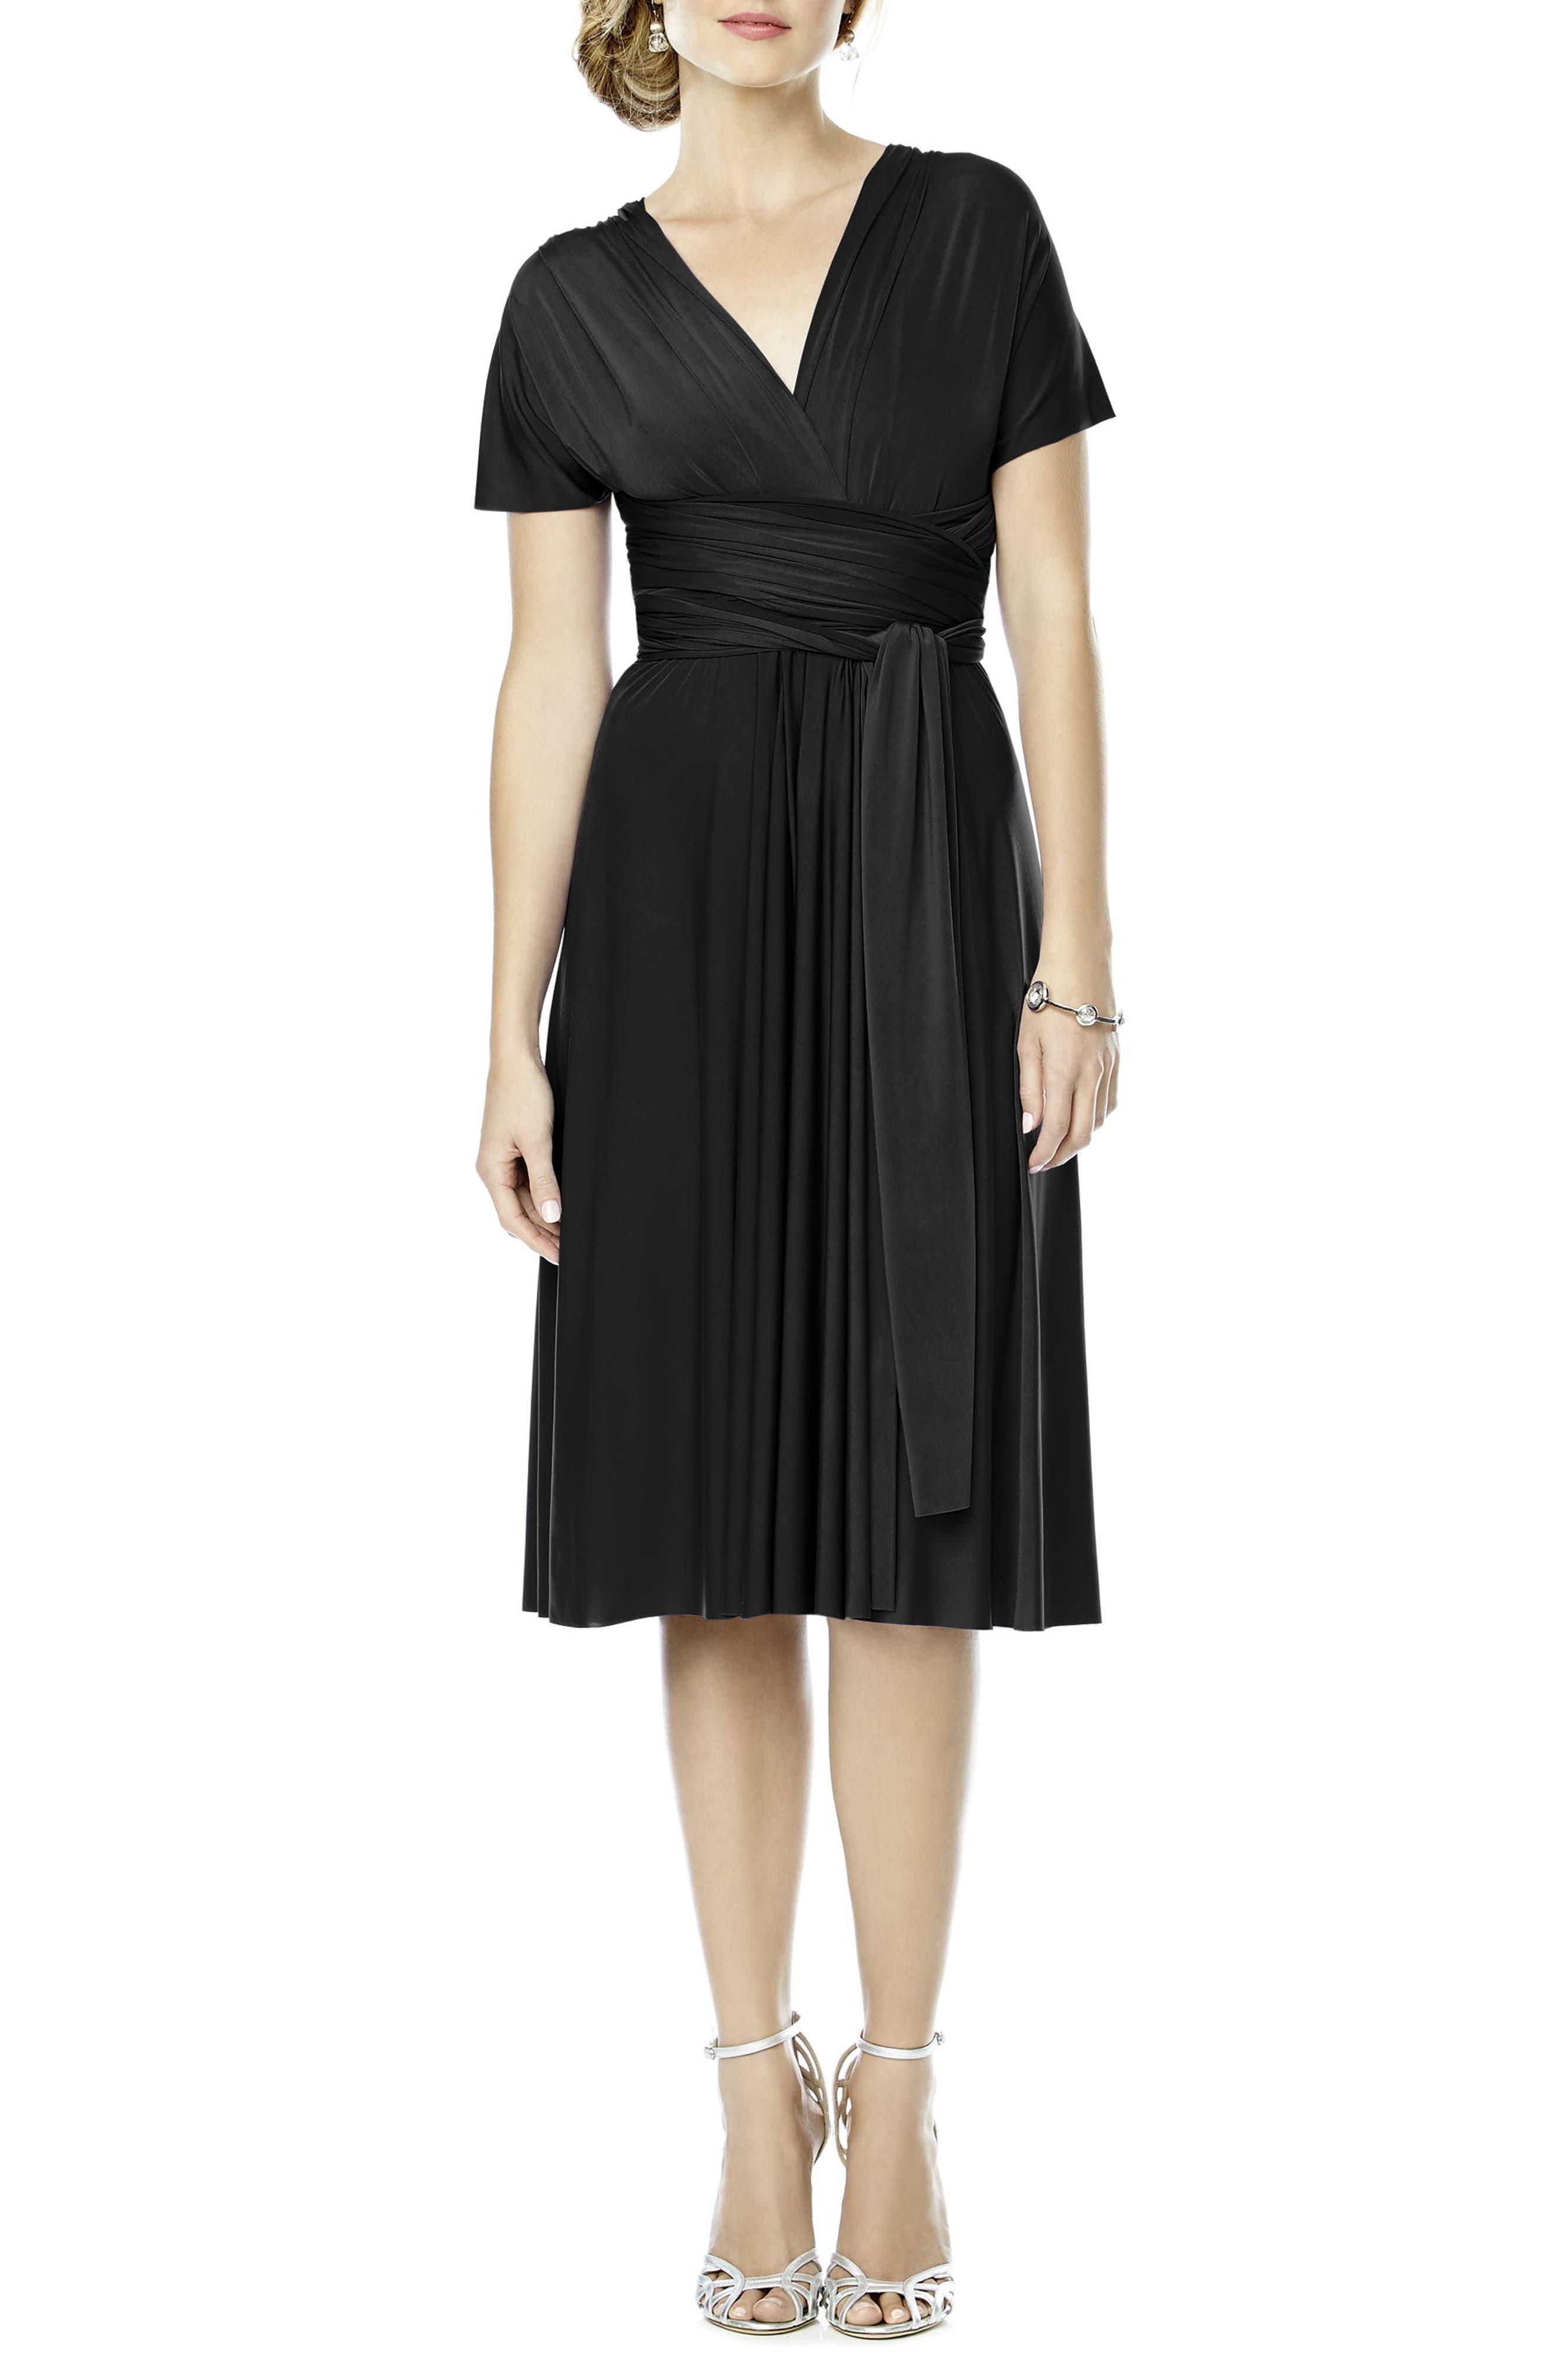 DESSY COLLECTION Convertible Wrap Tie Surplice Jersey Dress, Main, color, 001